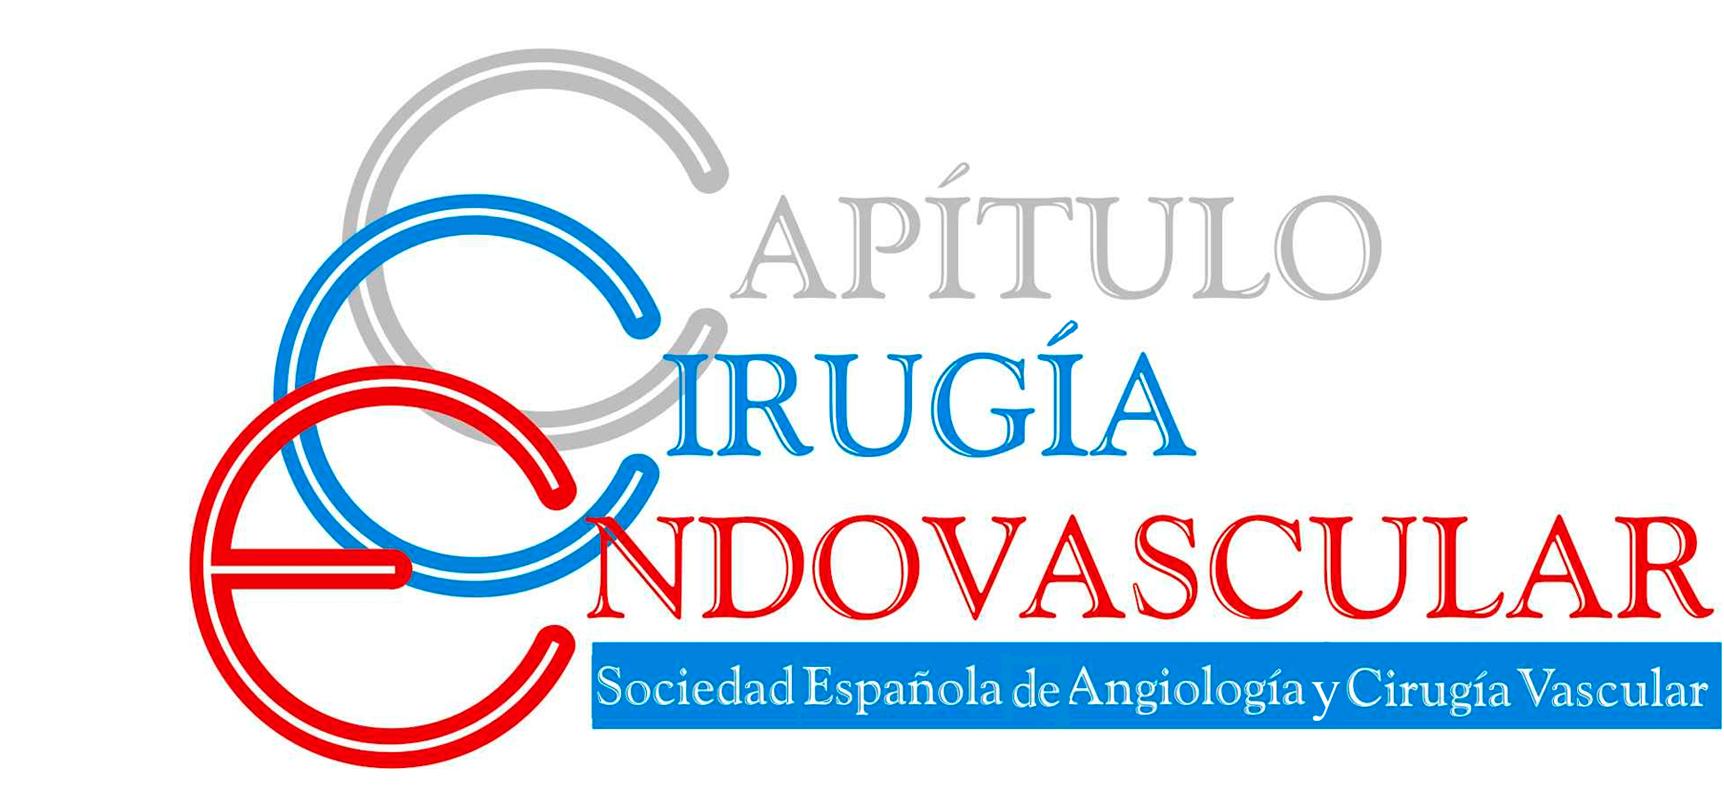 CAPÍTULO CIRUGÍA ENDOVASCULAR